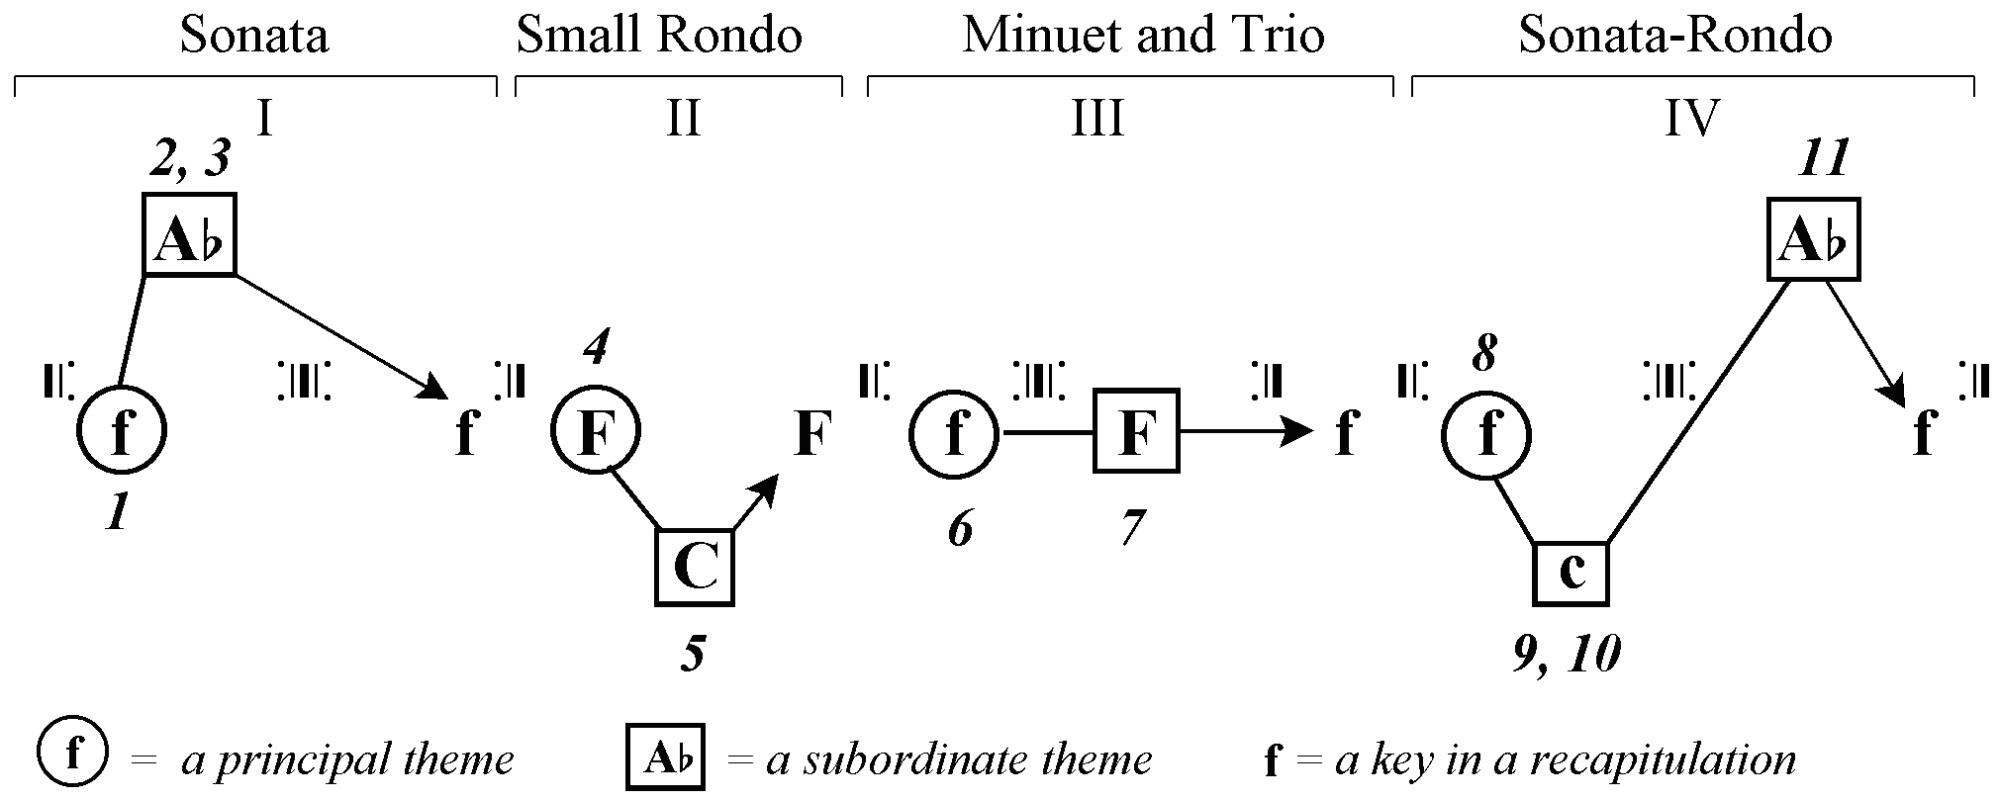 hight resolution of iii 01 15 sonata 1 png